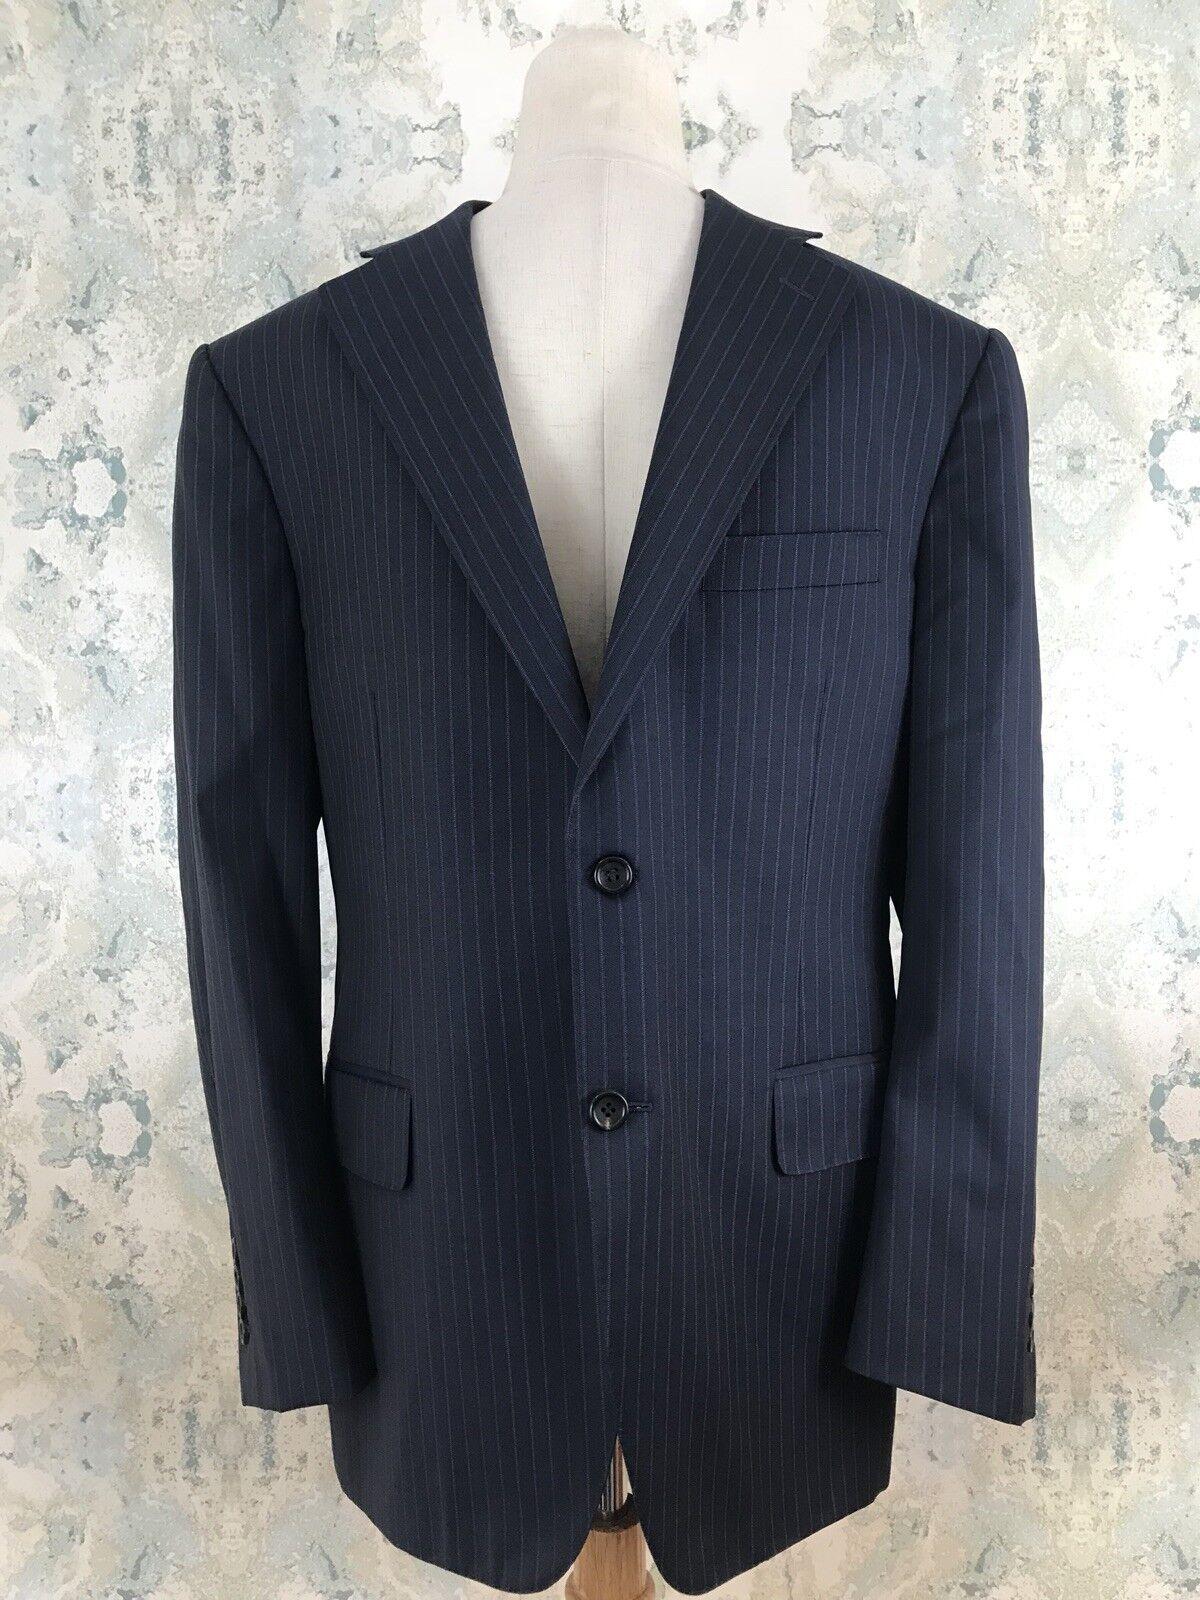 Canali Siena Blau Pinstripe Wool Italian Career Geschäft Blazer Sport Coat 42 S